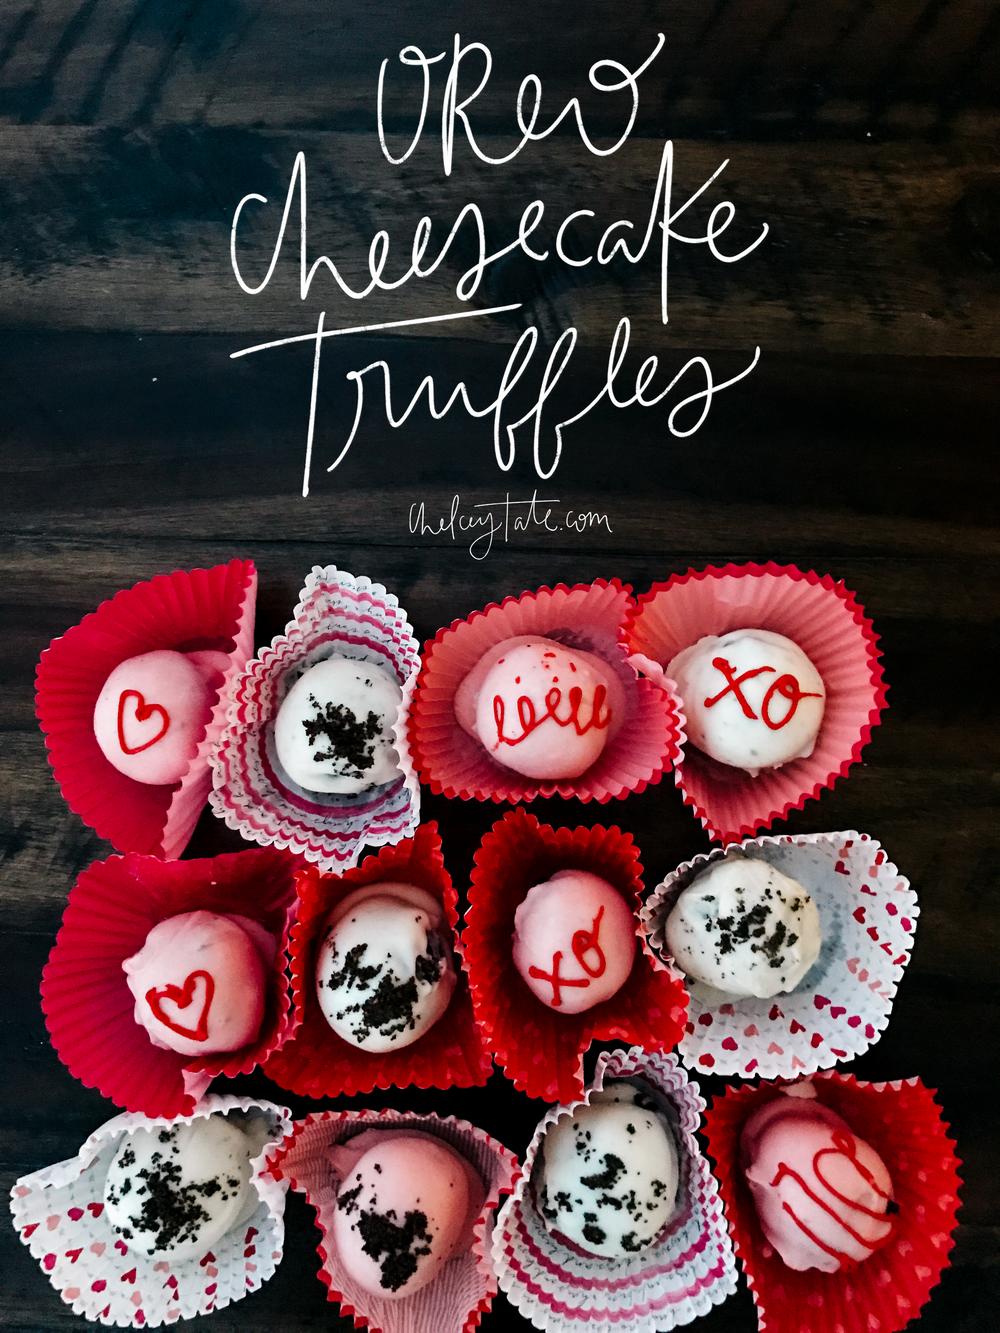 Oreo Cheesecake Truffles via chelceytate.com